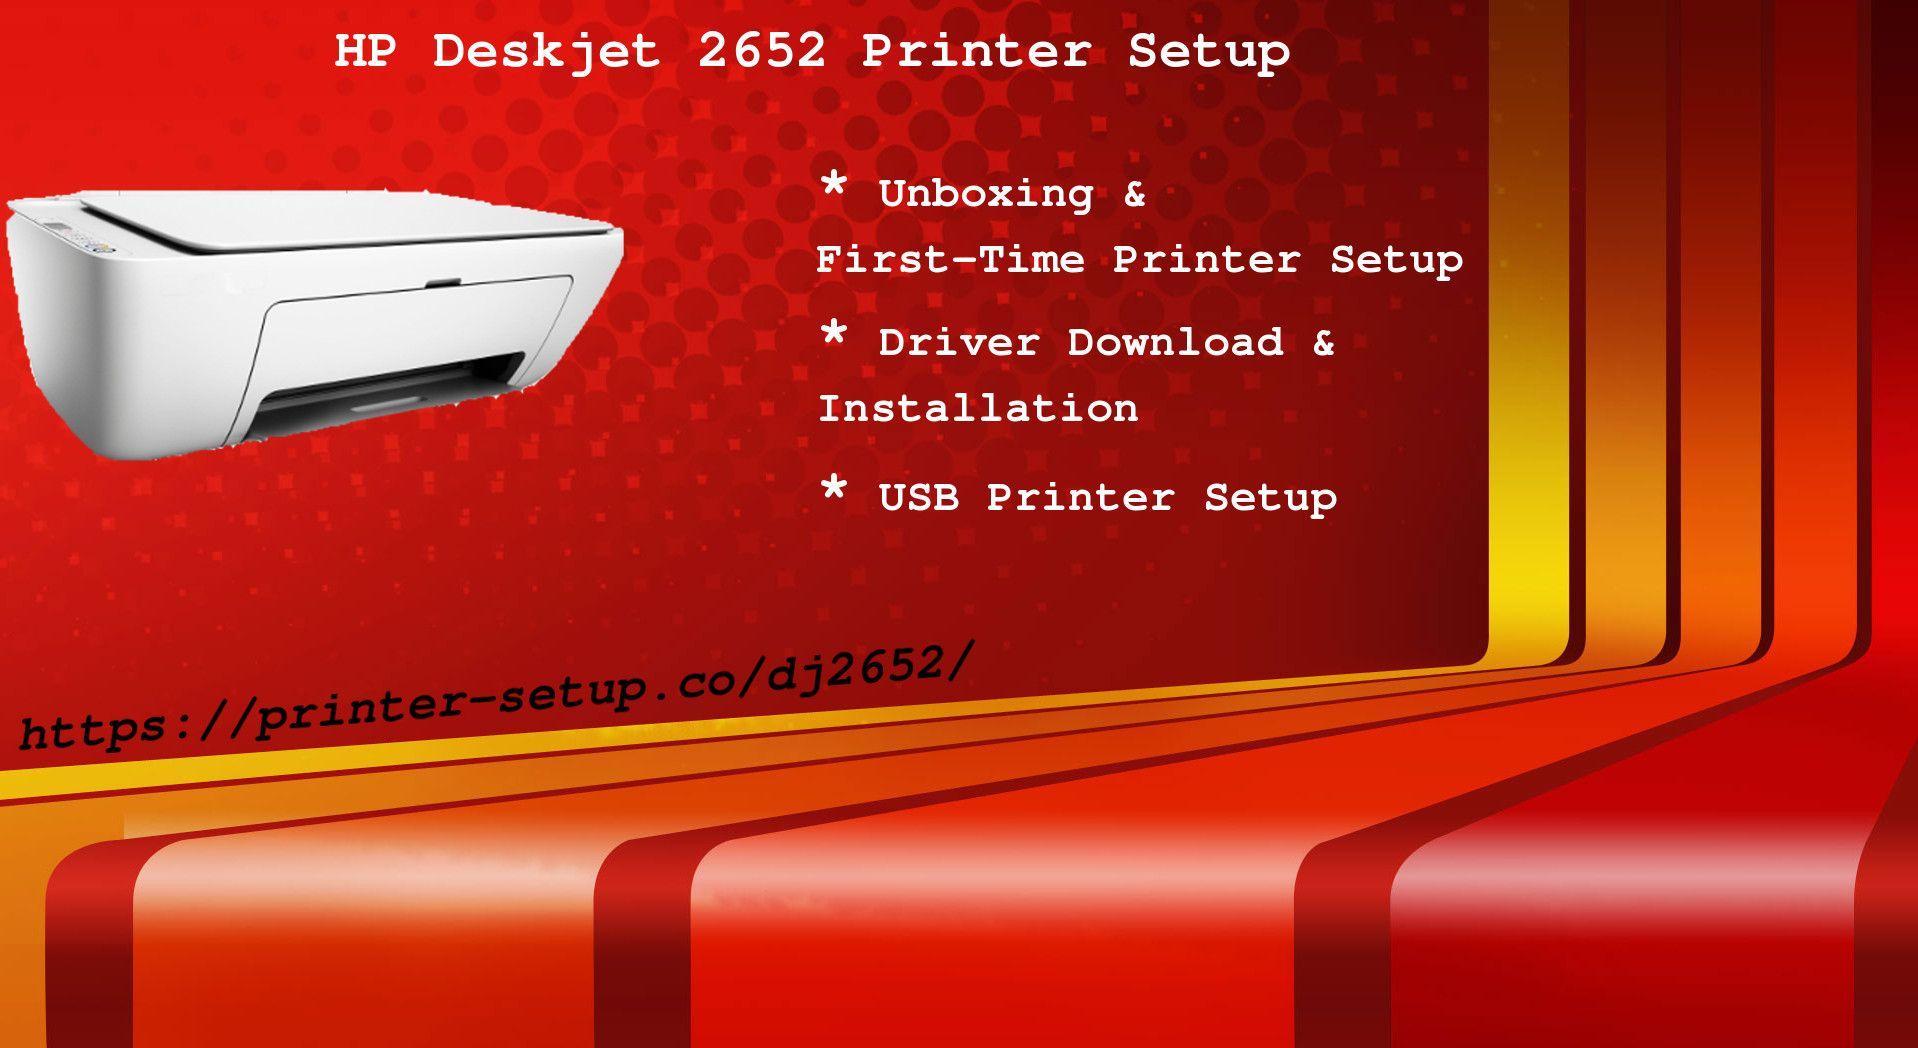 Quick & Easy StepbyStep Instructions for 123 HP Deskjet